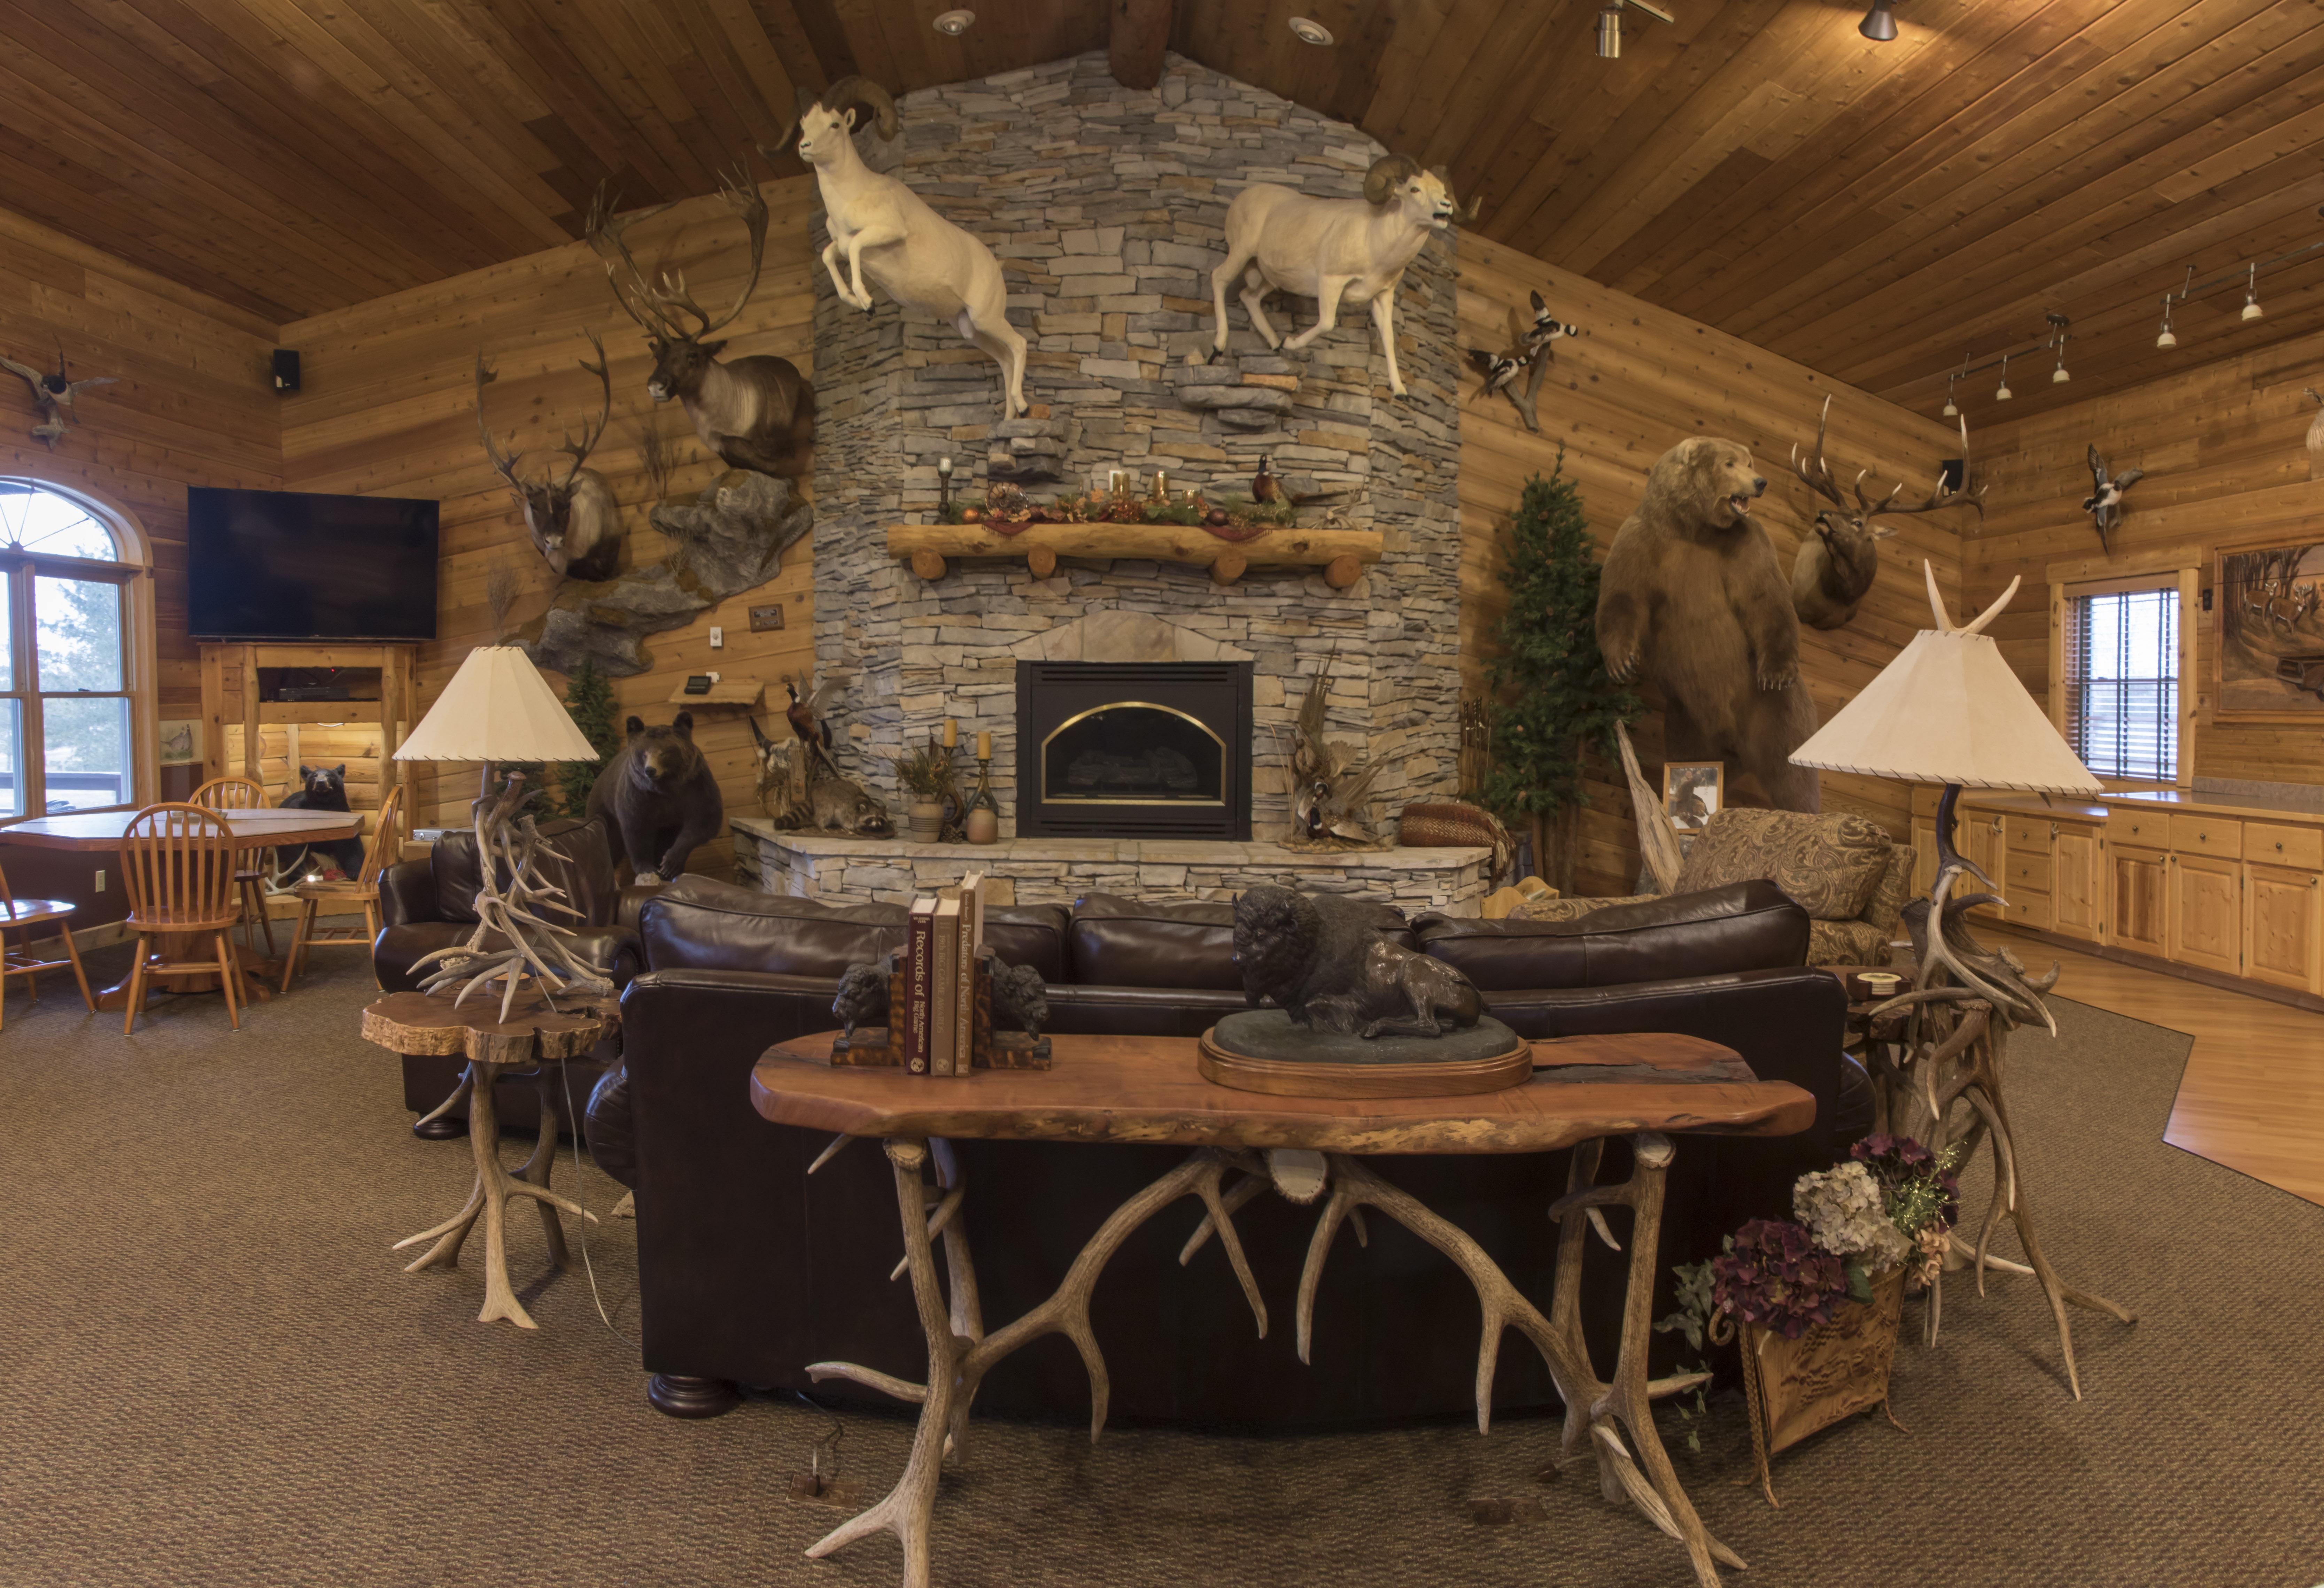 The lodge at Stukel's